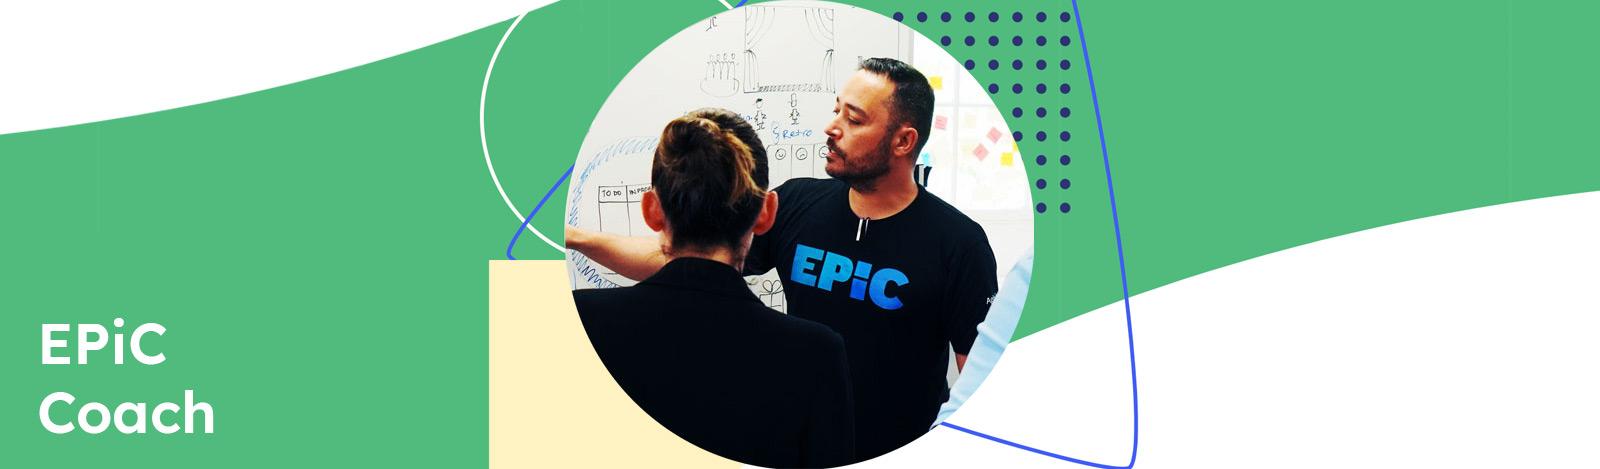 Courses-Epic-Agile---Coach-Training_ARLO_1600x469.jpg